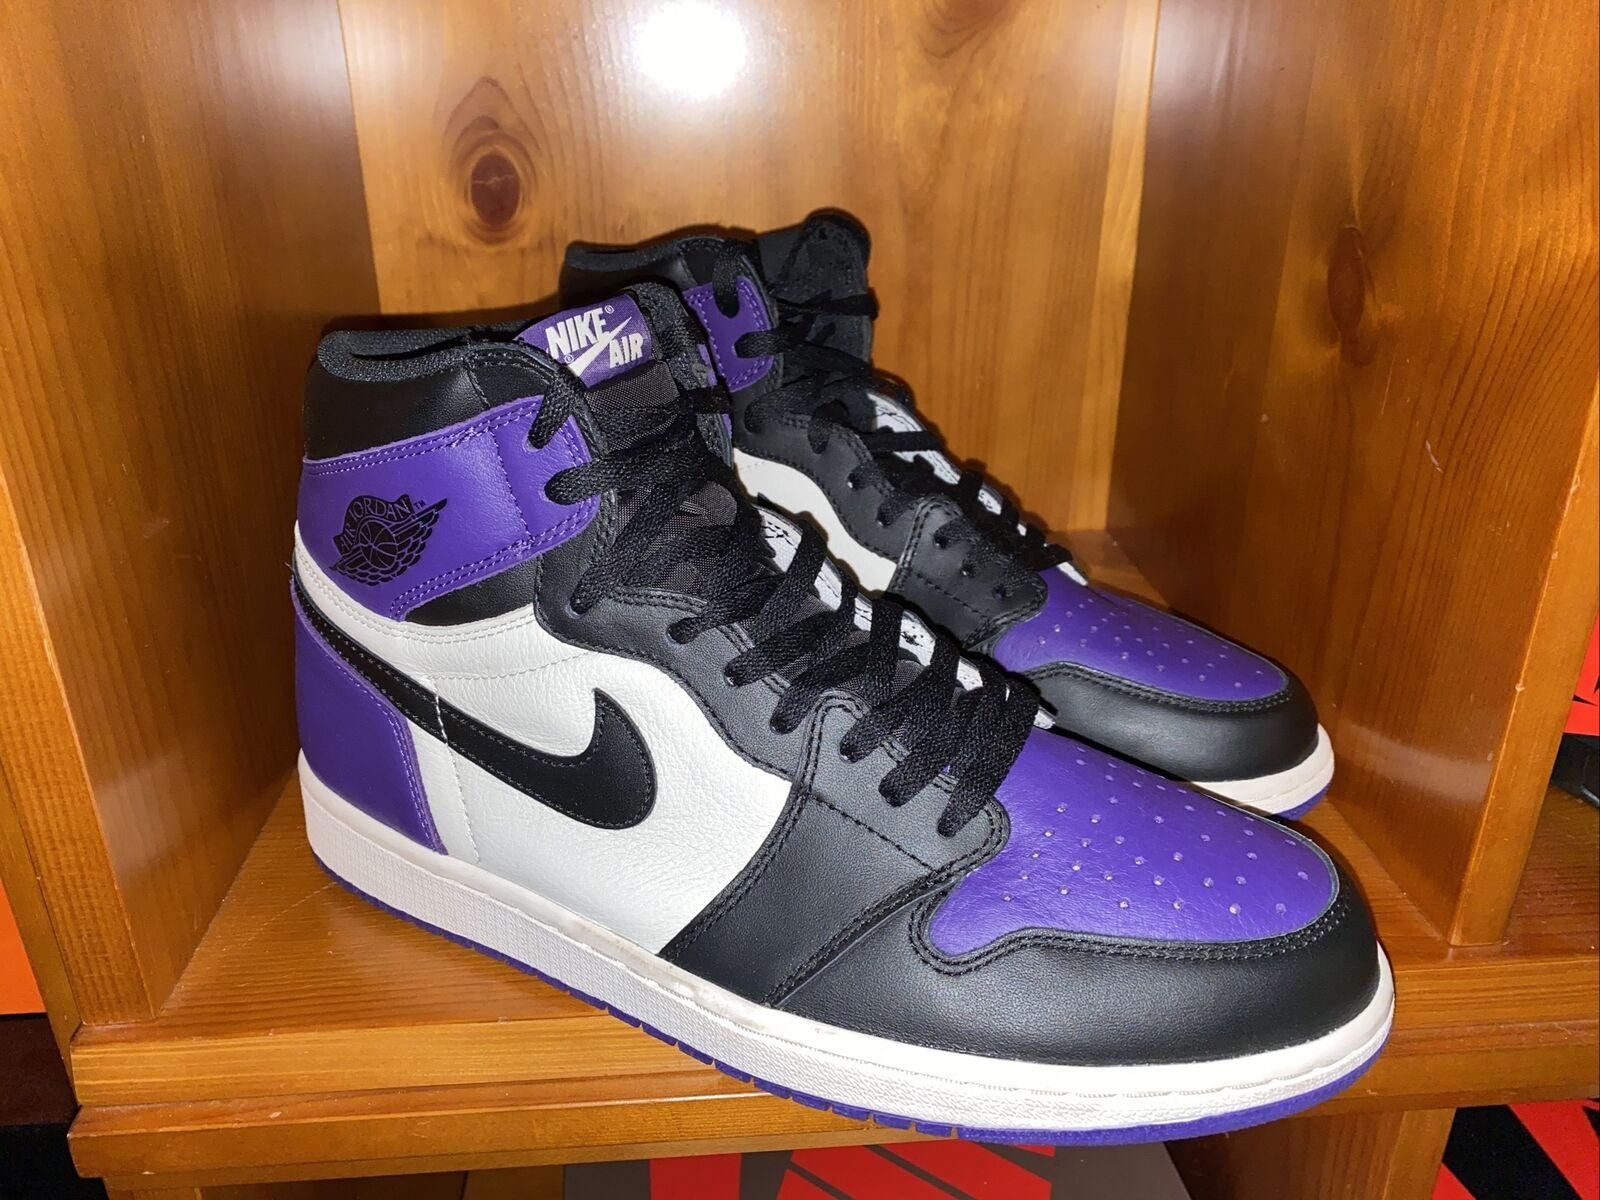 Jordan 1 Retro High OG Court Purple 1.0 2018 Size 12